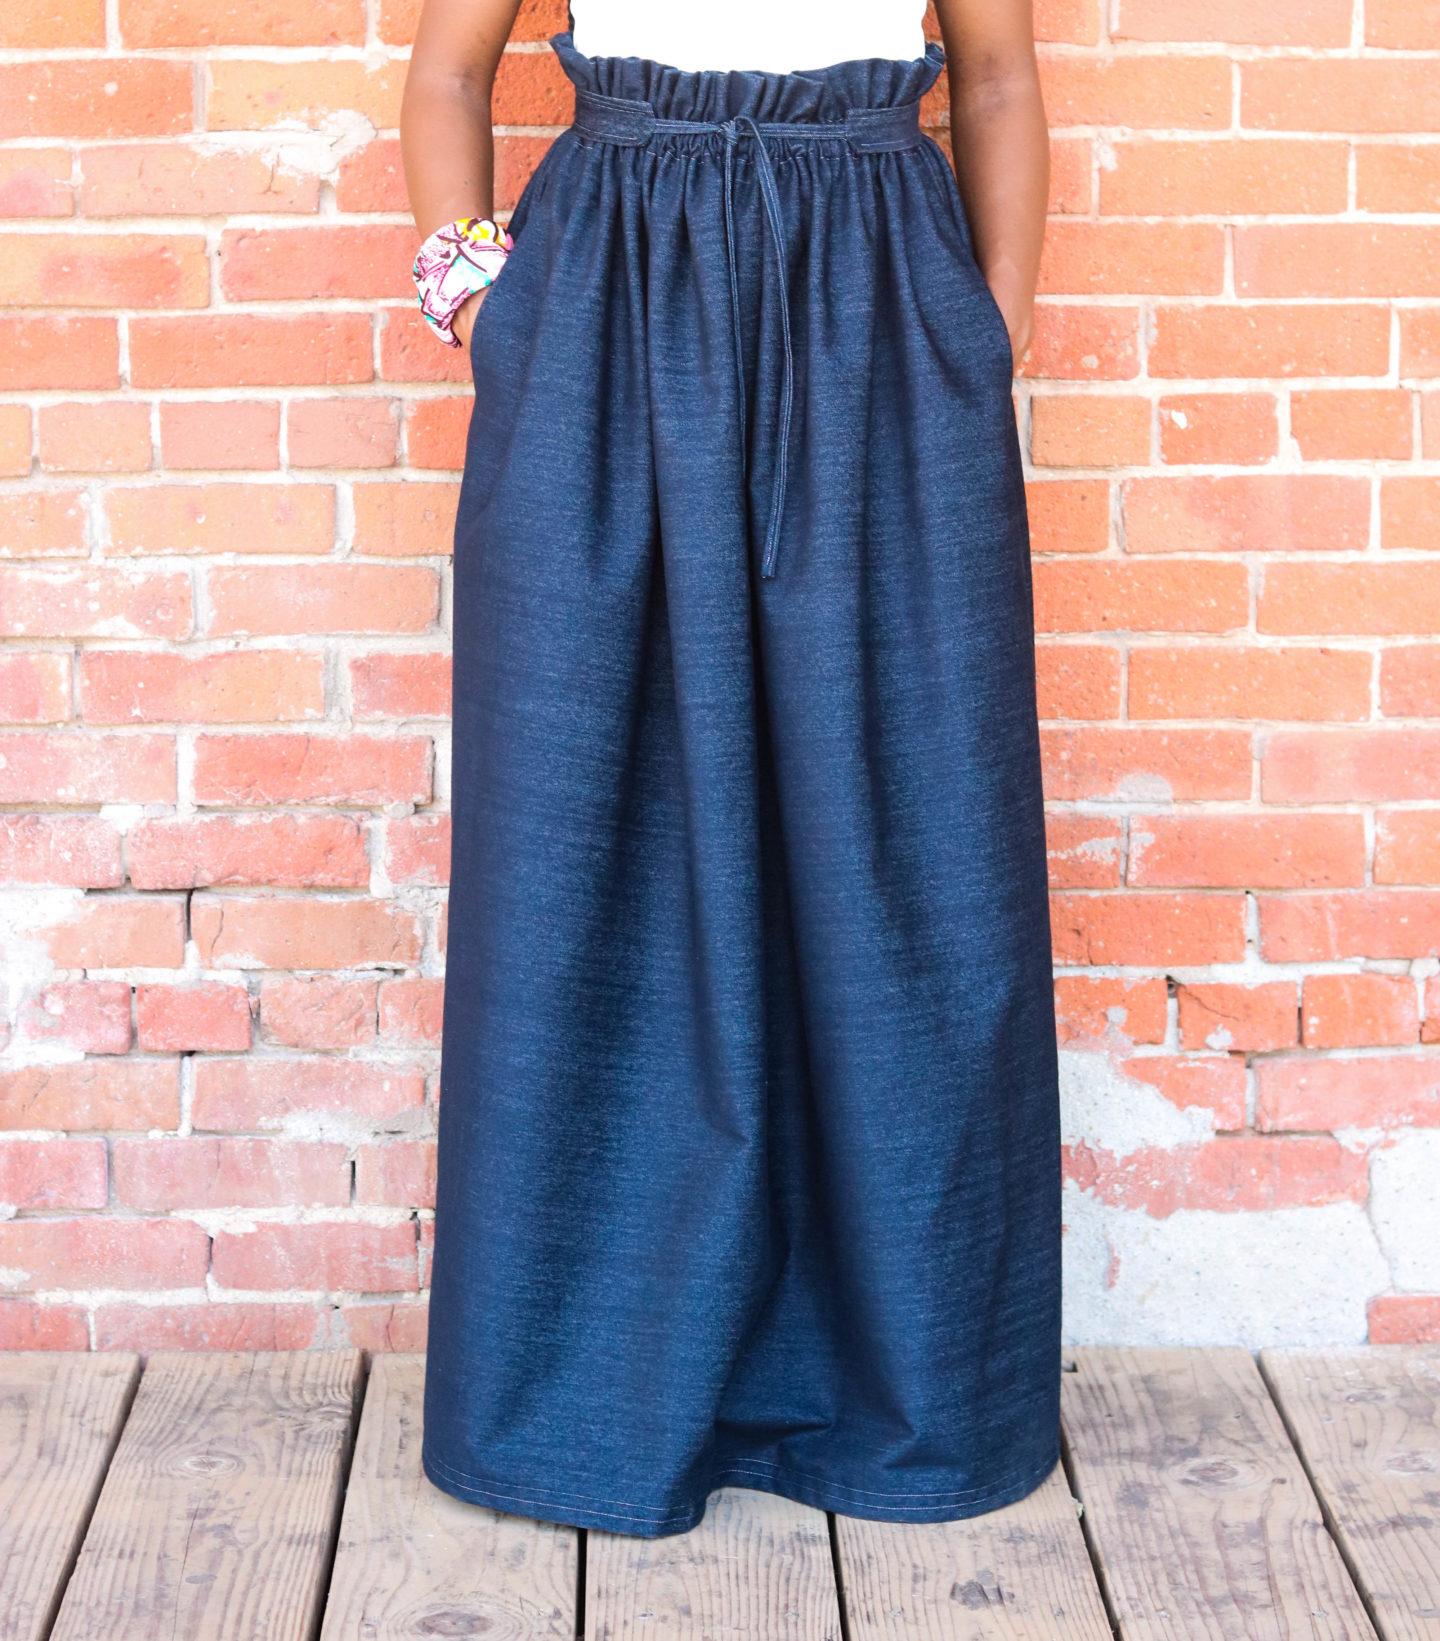 Denim Skirt, Paperbag Skirt, DIY Paperbag Maxi Skirt, Maxi Skirt, Denim Maxi Skirt